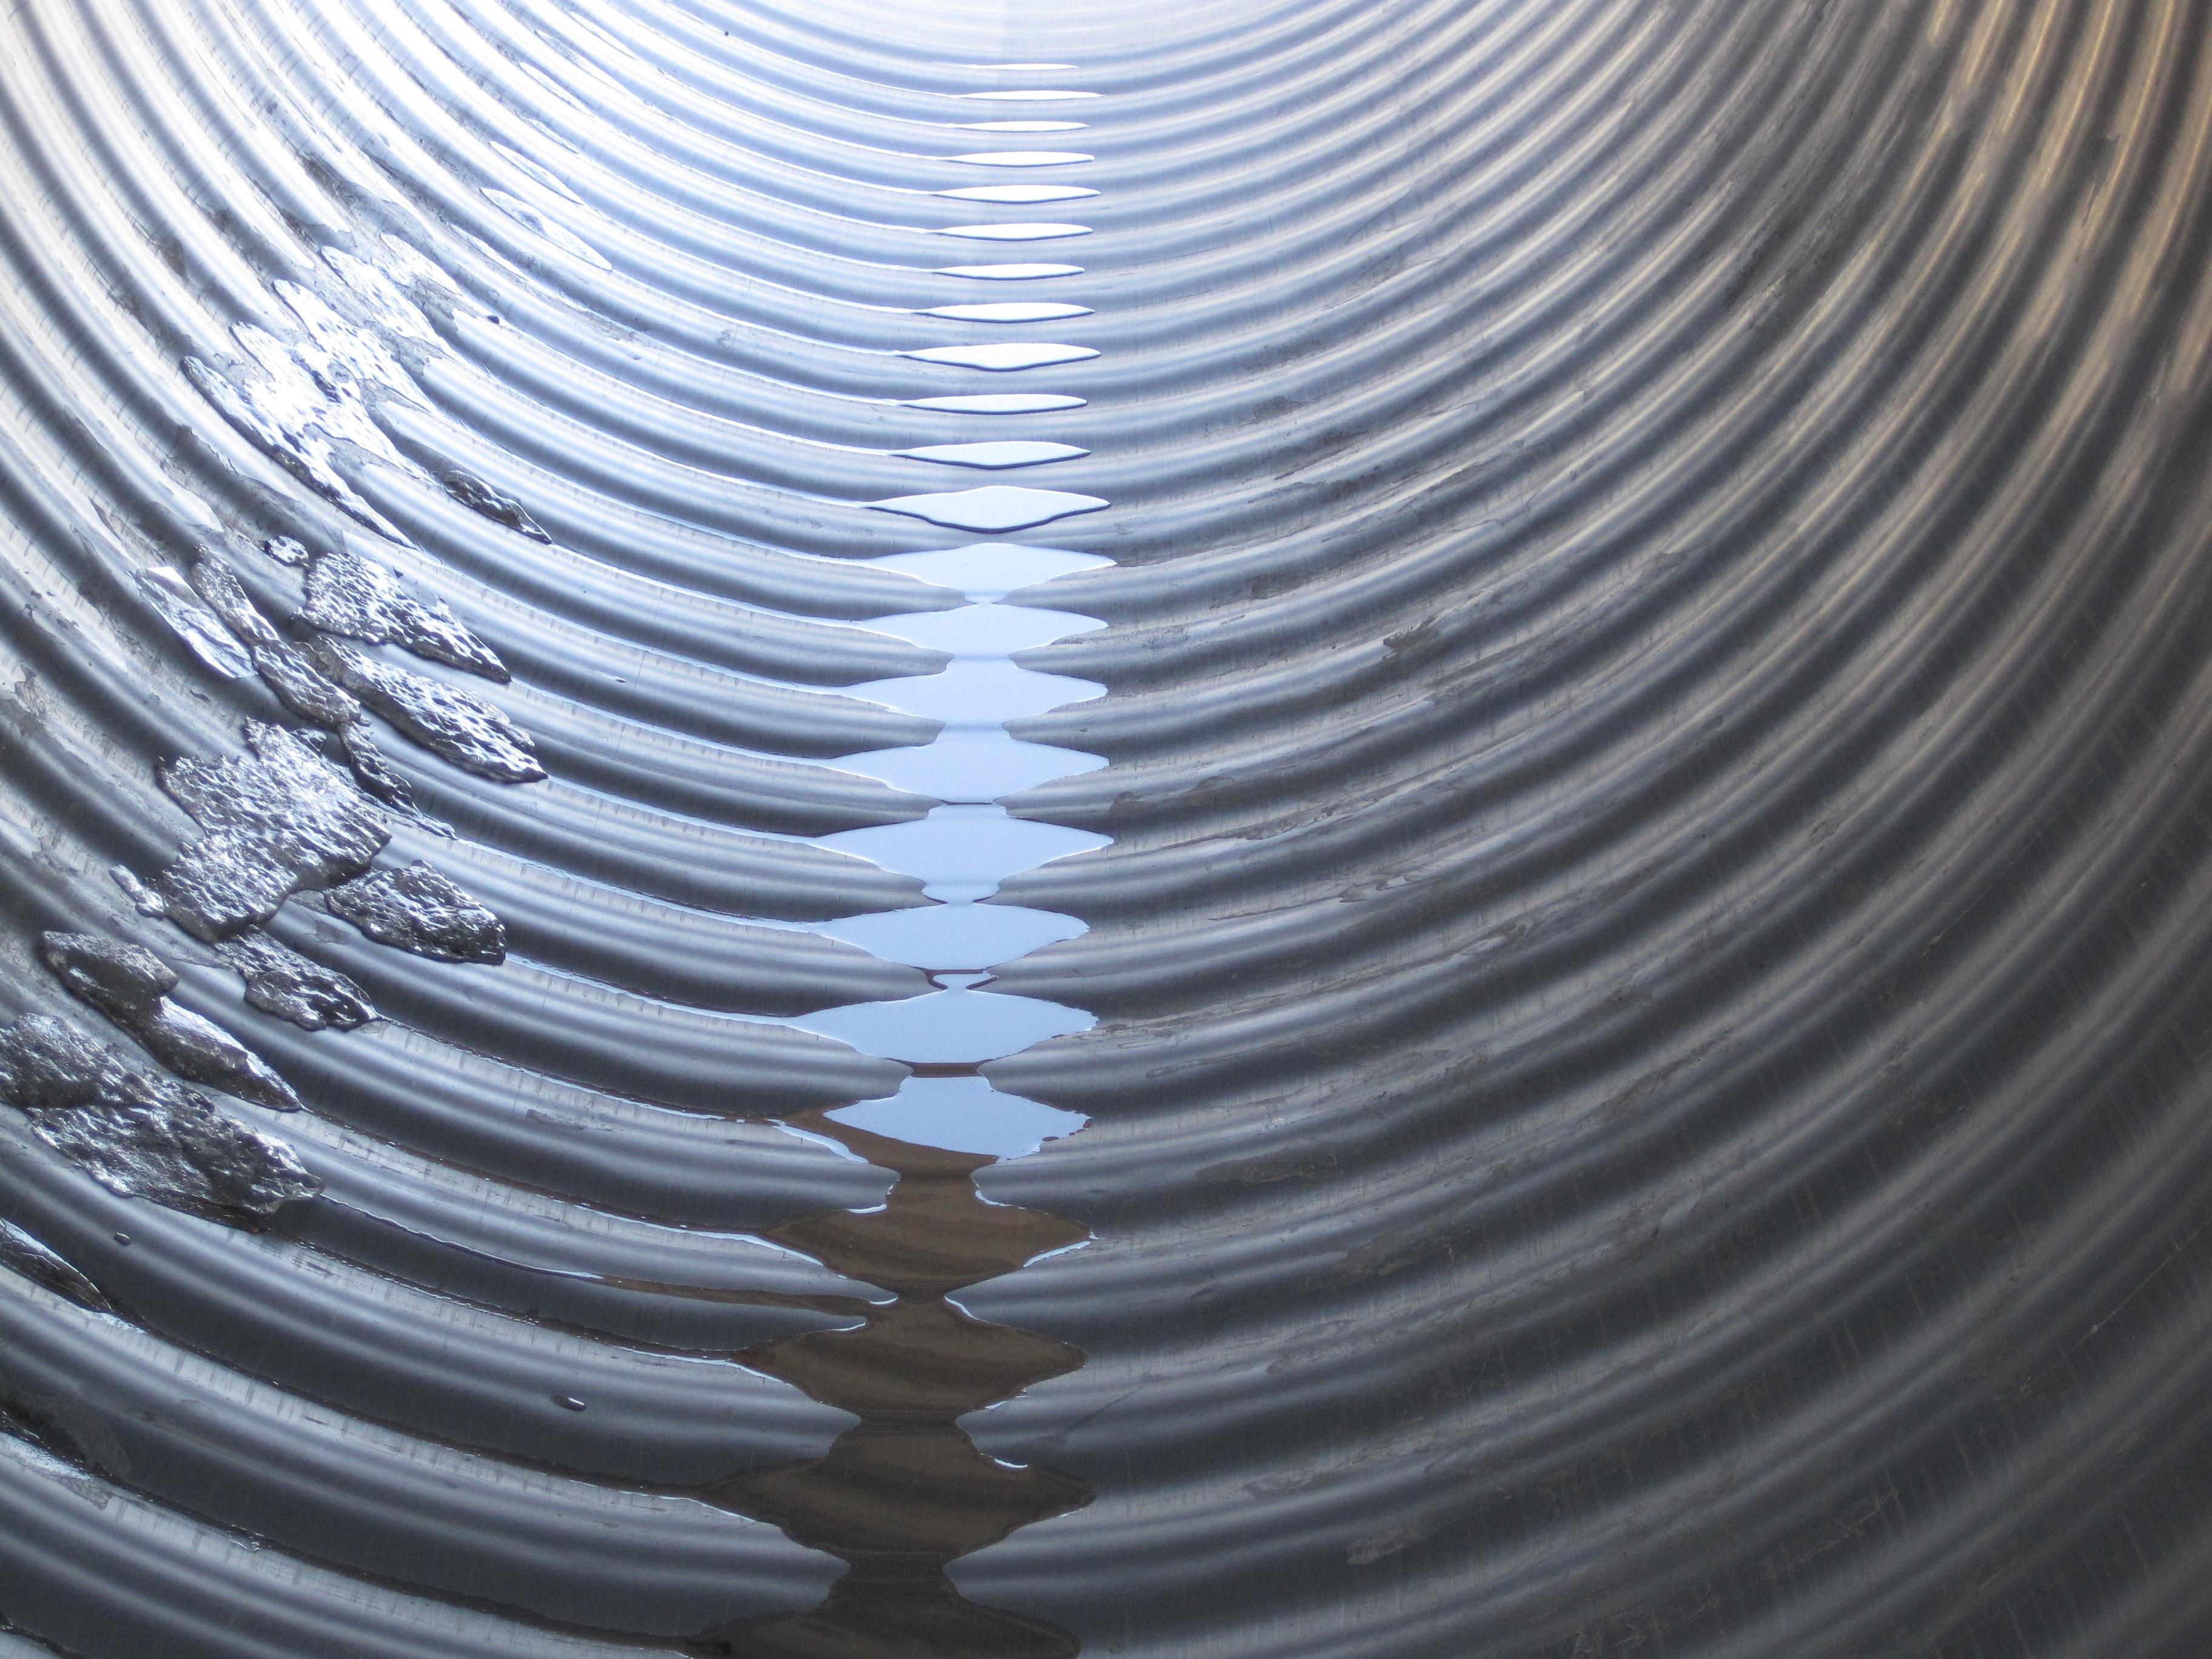 corrugated plastic pipe